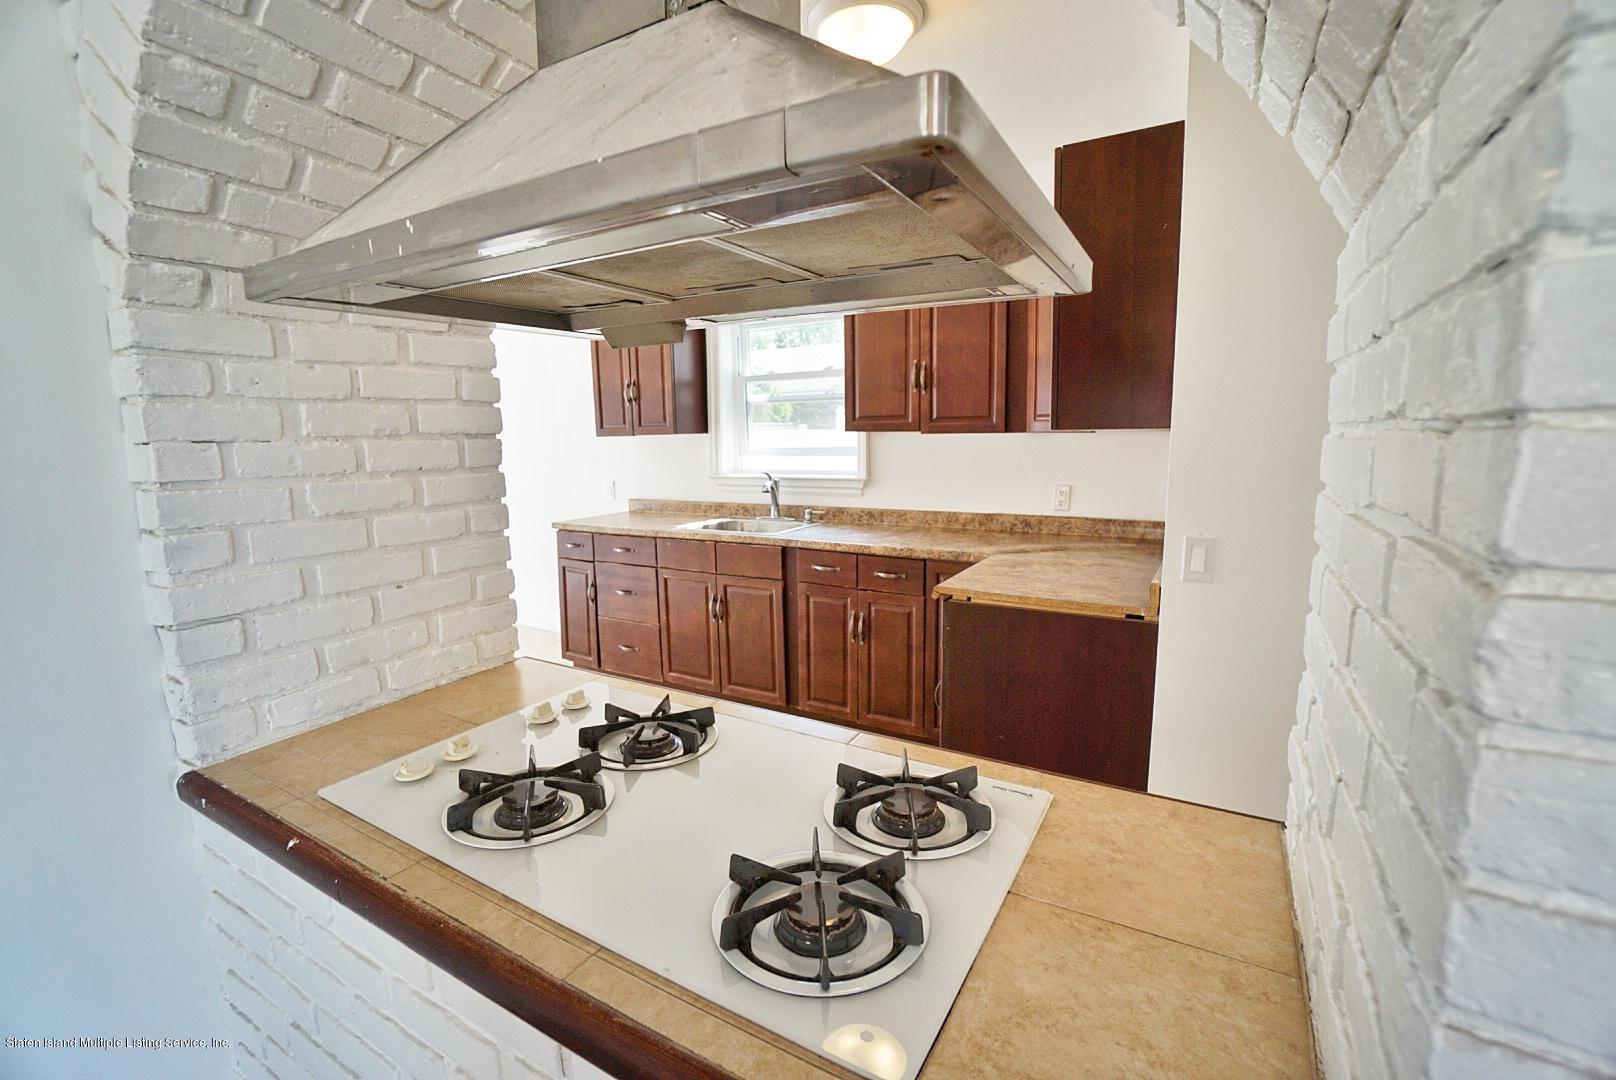 Single Family - Detached 53 Dubois Avenue  Staten Island, NY 10310, MLS-1128749-17